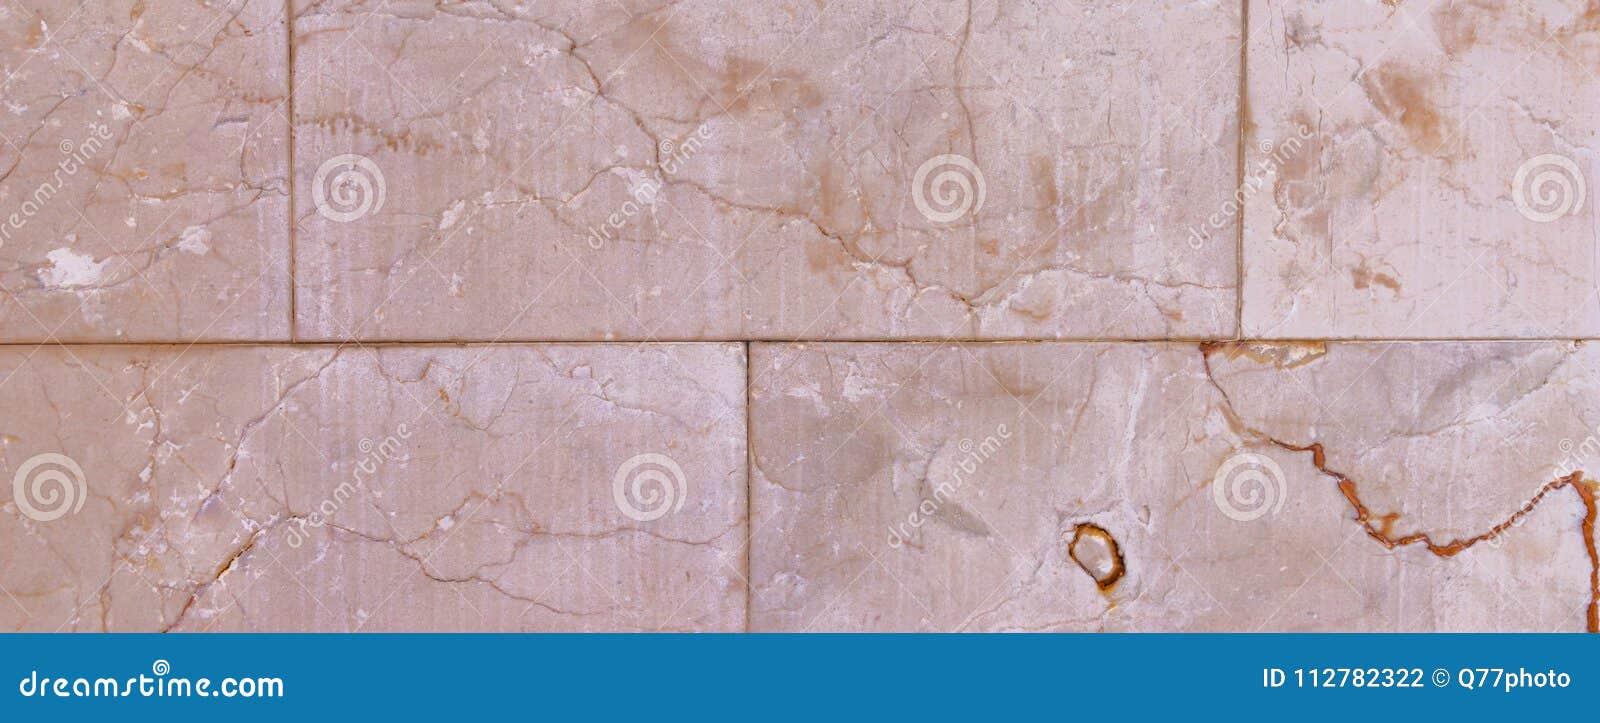 Traditional Ornamental Spanish Decorative Tiles, Original Cerami ...